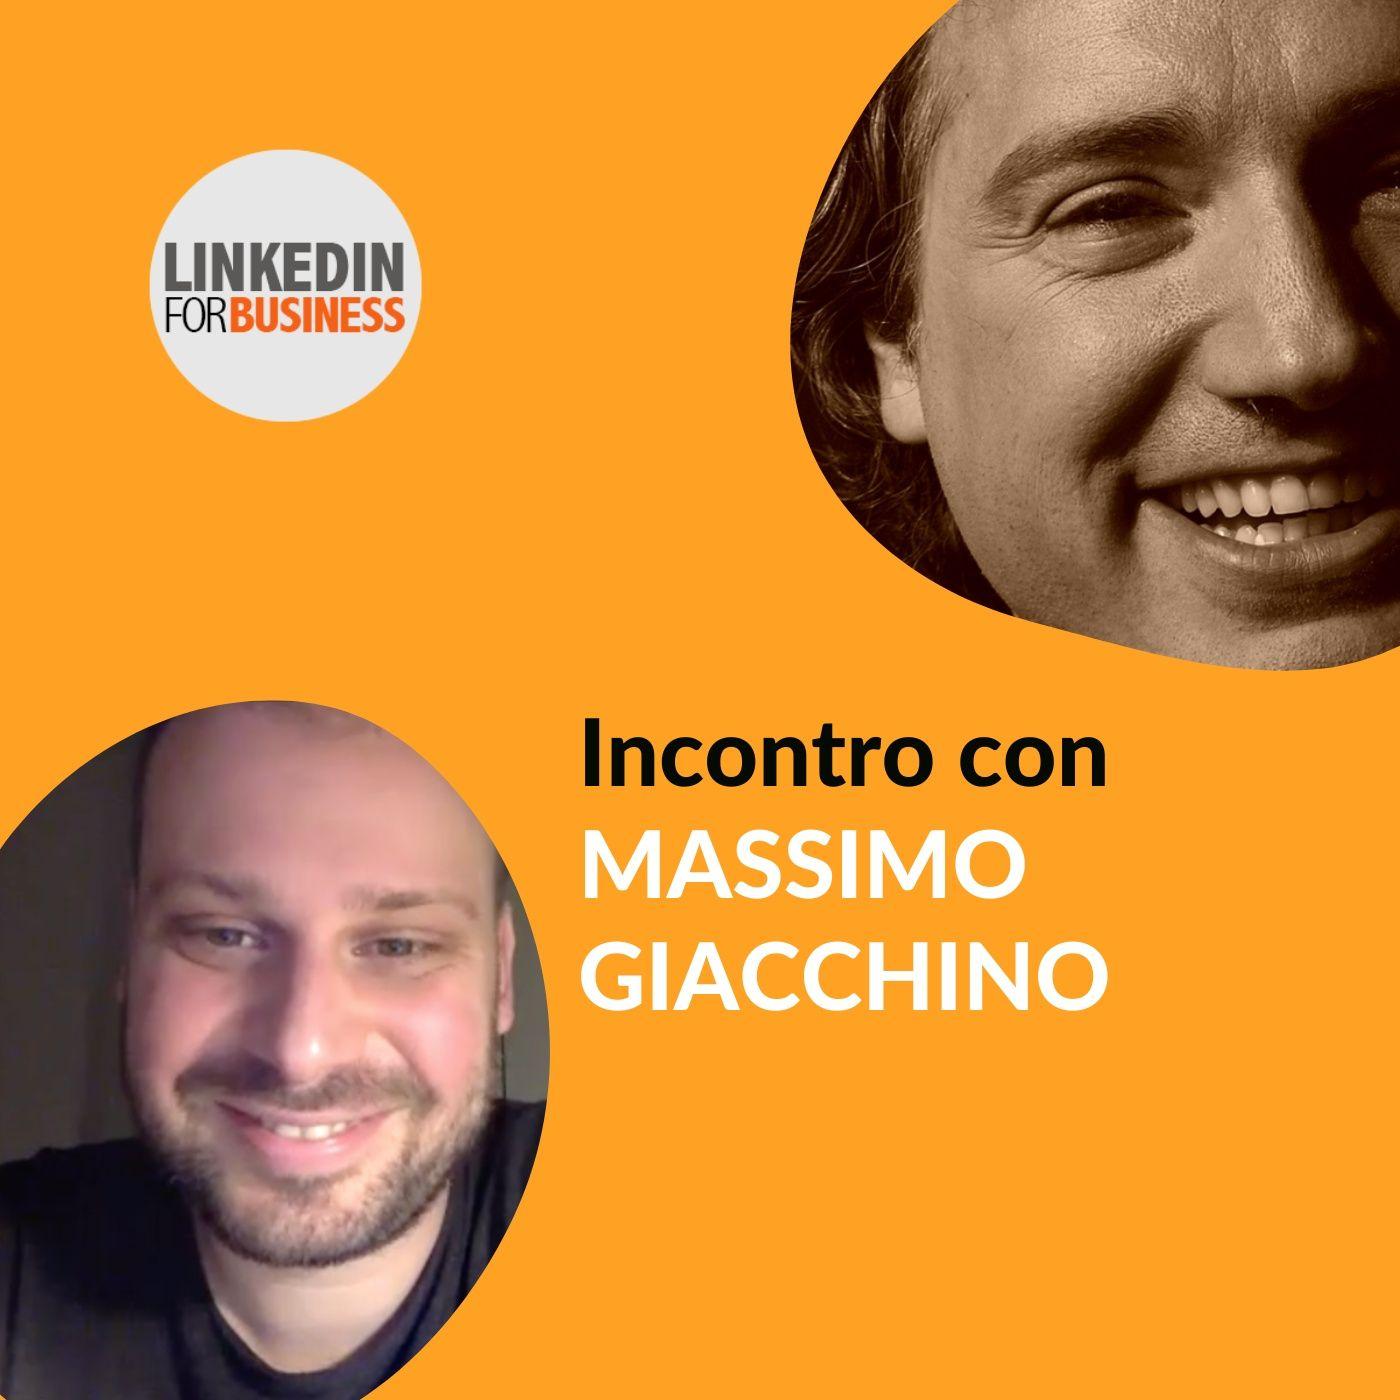 127 - LinkedInForBusiness incontra Massimo Giacchino